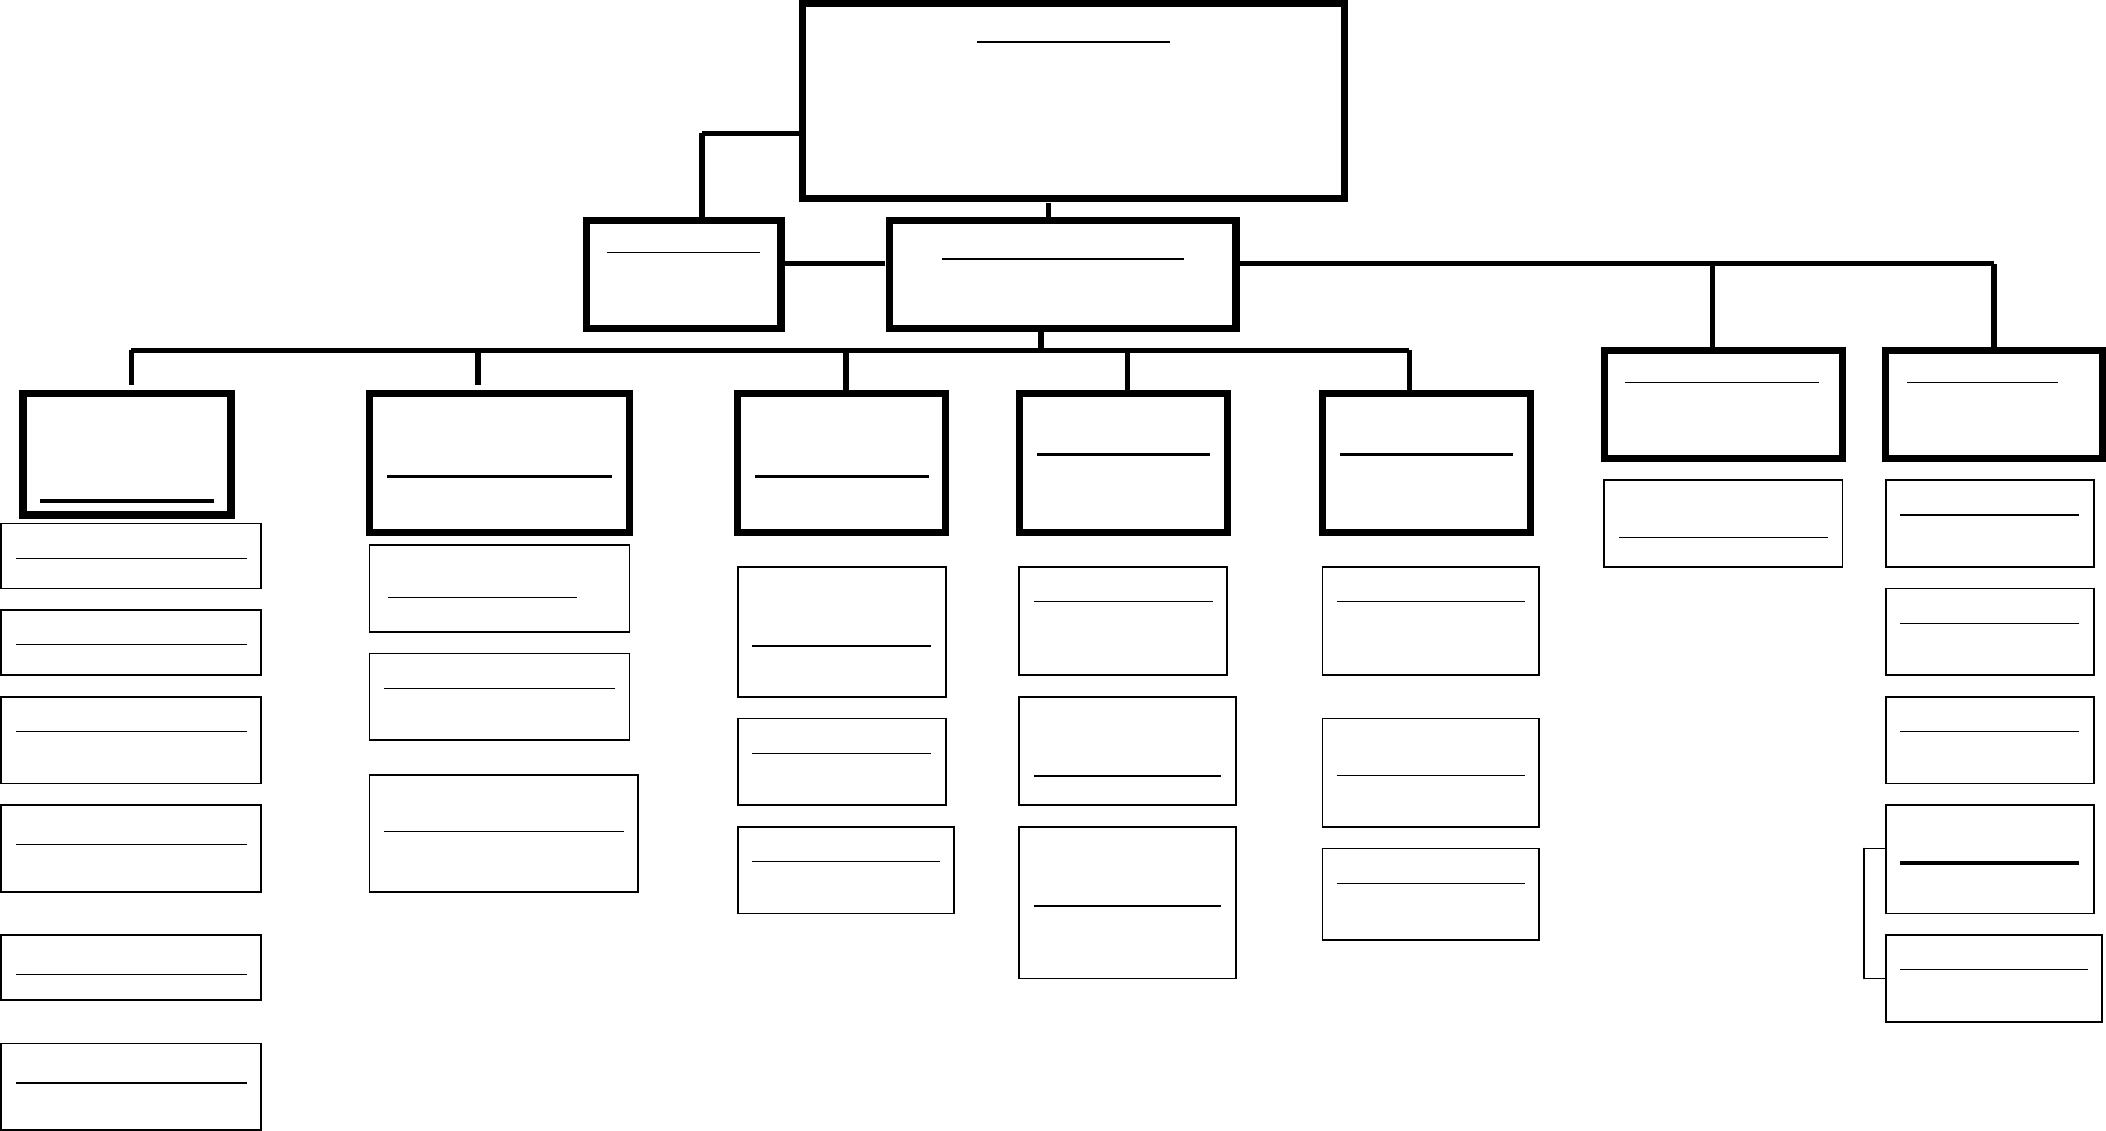 Blank Organizational Chart - Cumberland College Free Download